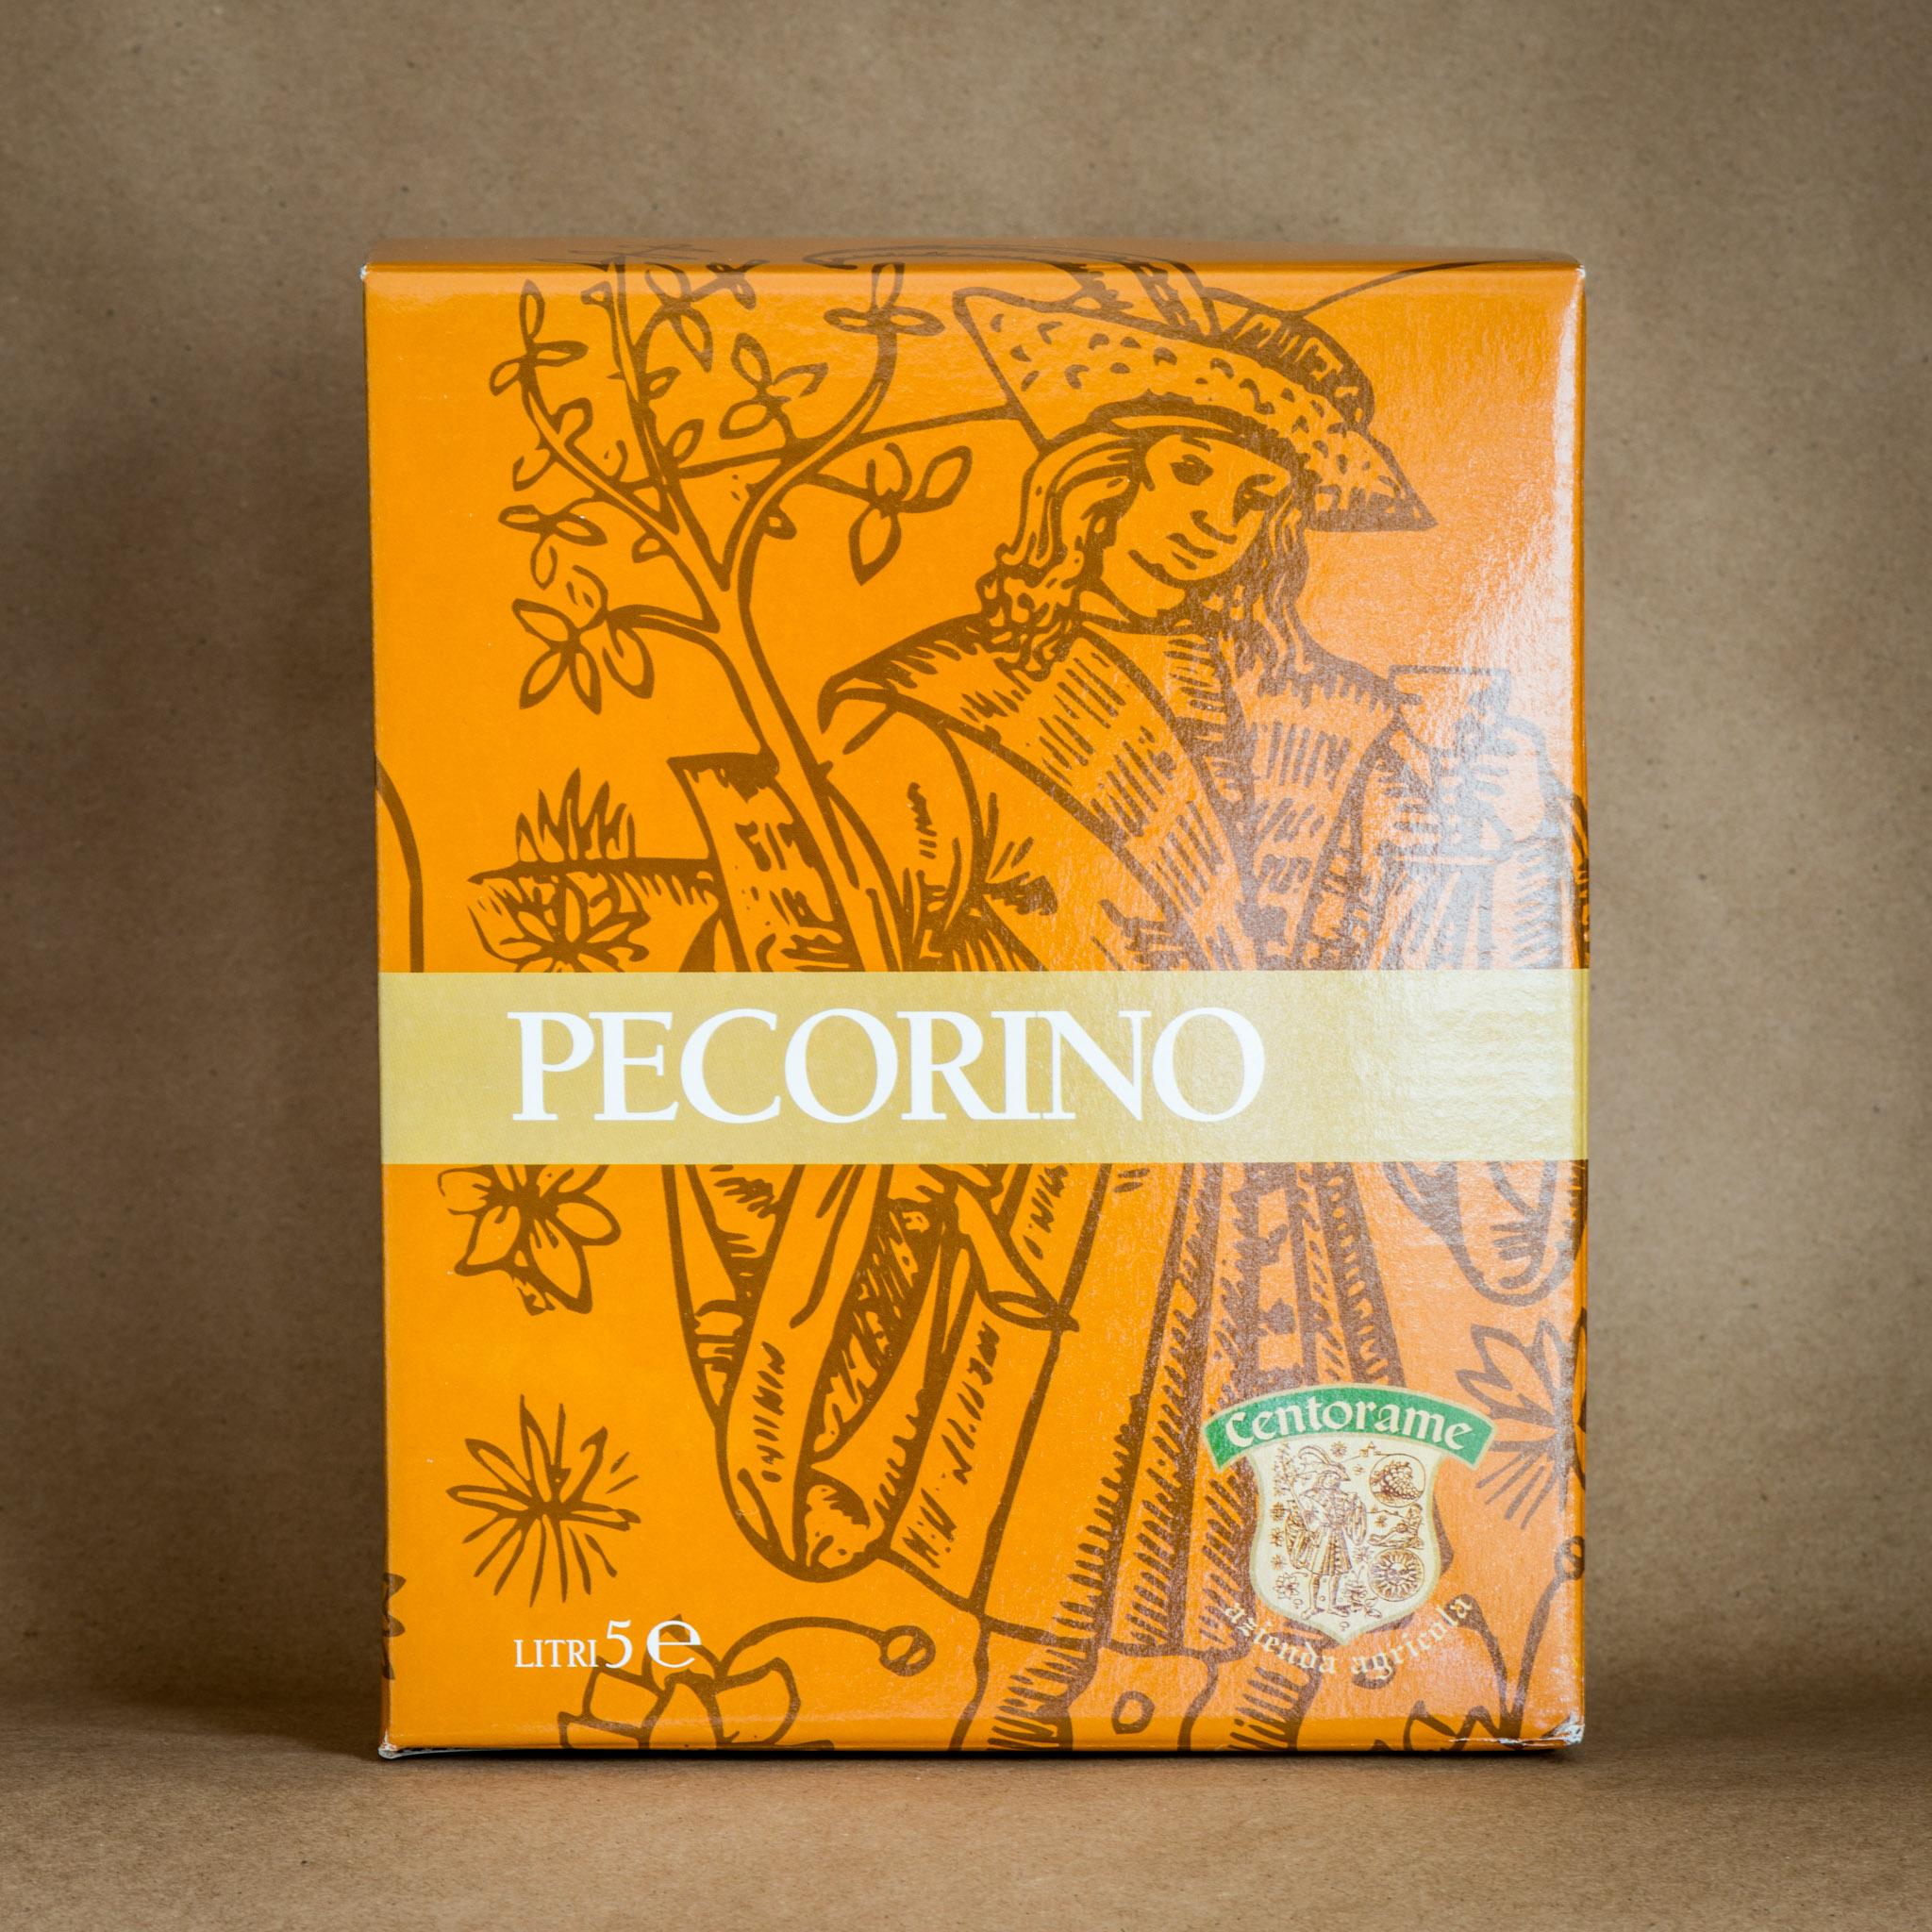 Product - Centorame Pecorino BiB.jpg